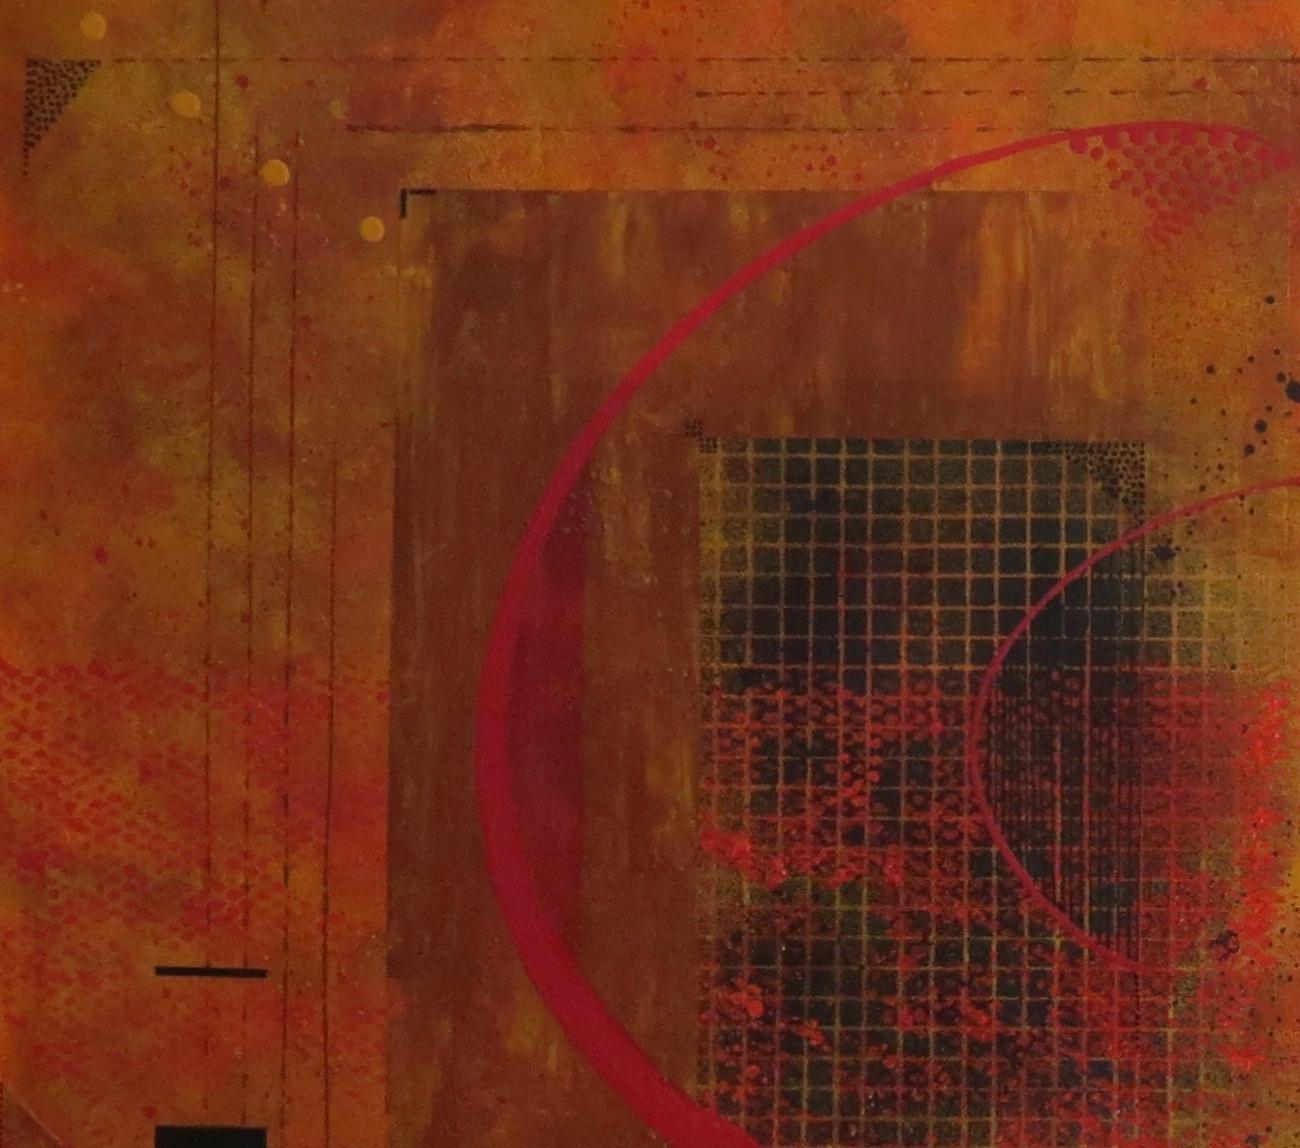 dzëta - vue zoom2 - DALUZ GALEGO - peinture abstraite